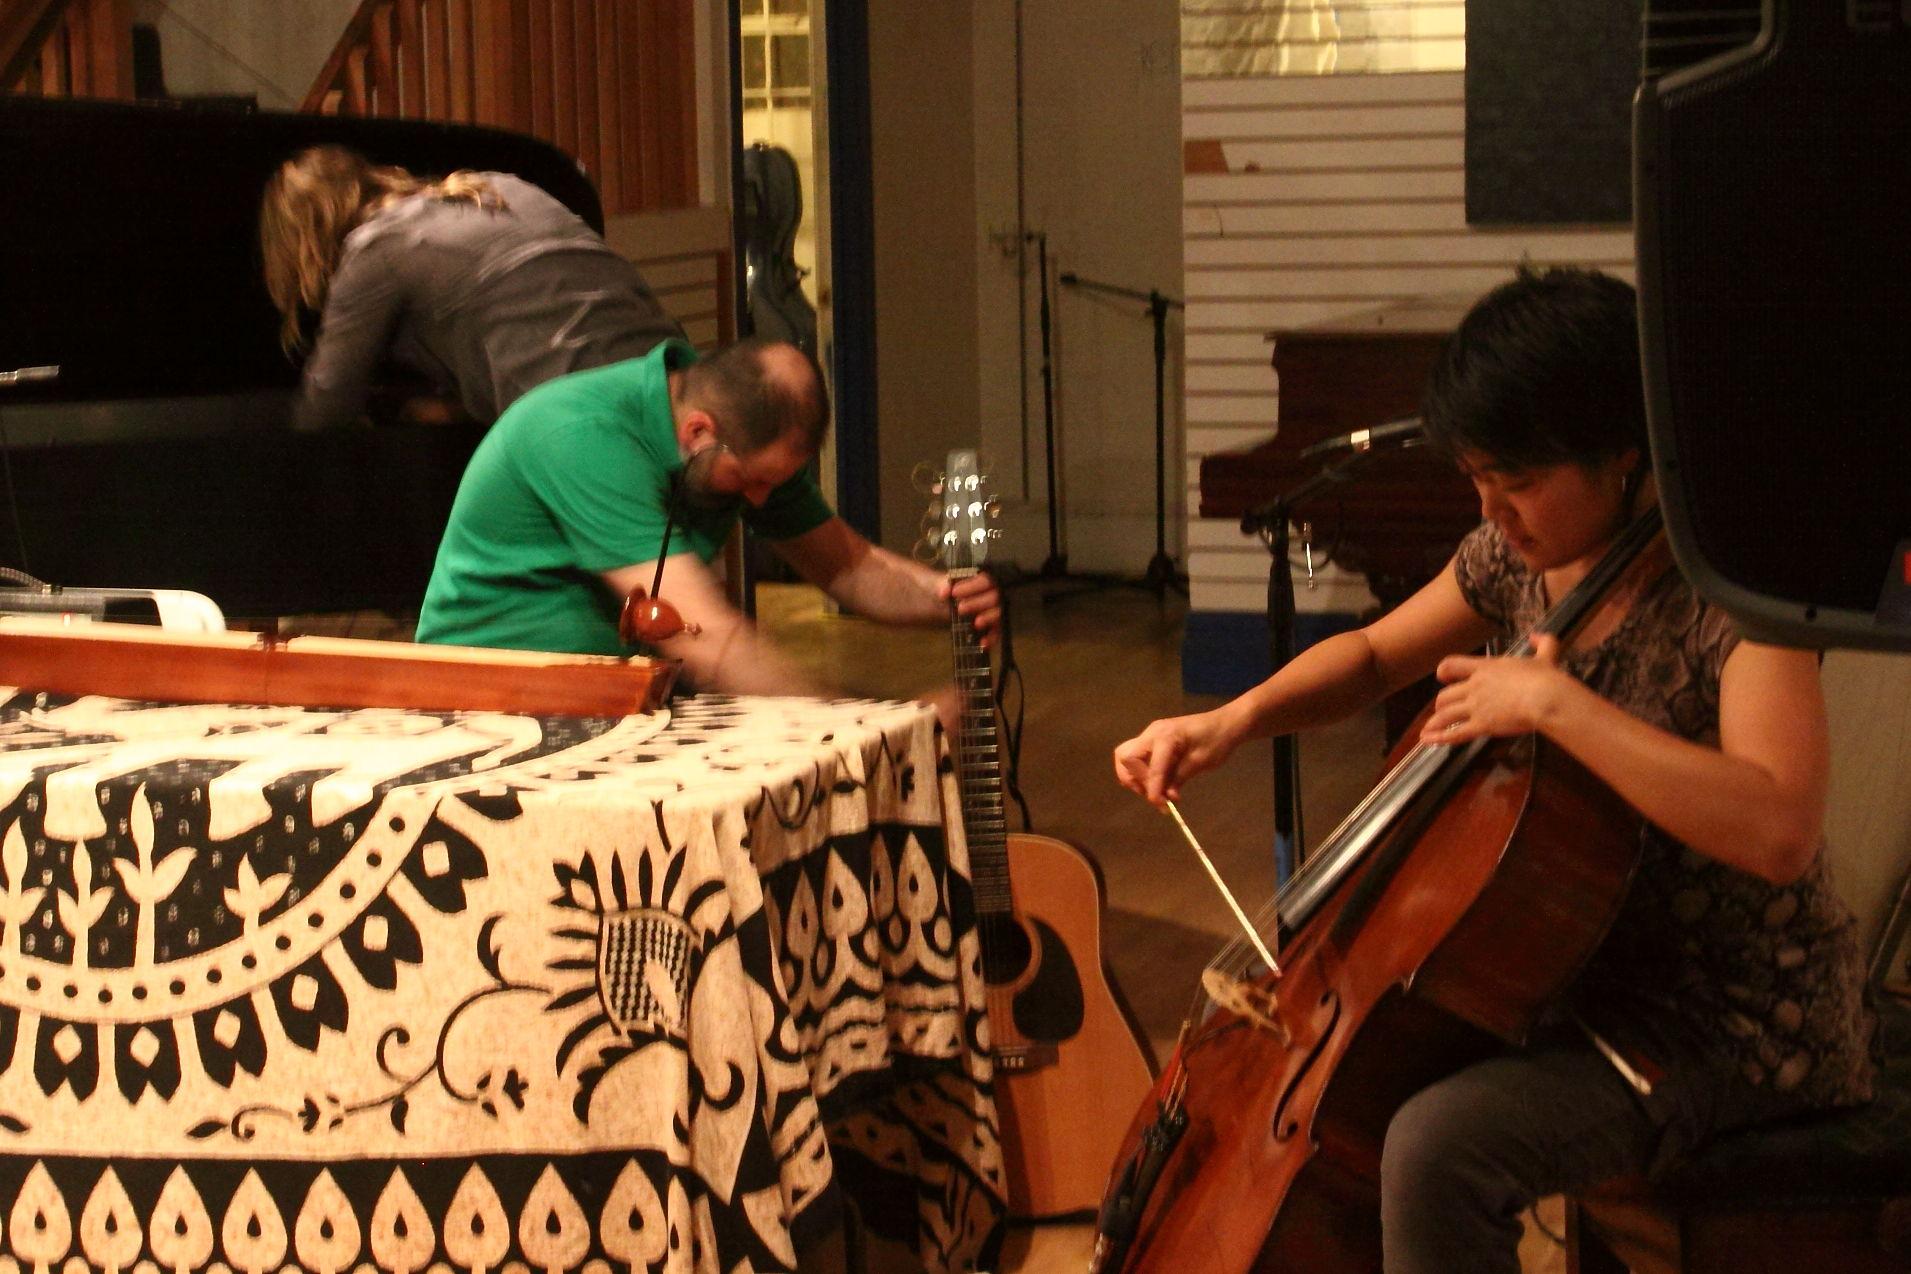 Annie Lewandoski, Luciano Chessa and Theresa Wong in a trio improvisation